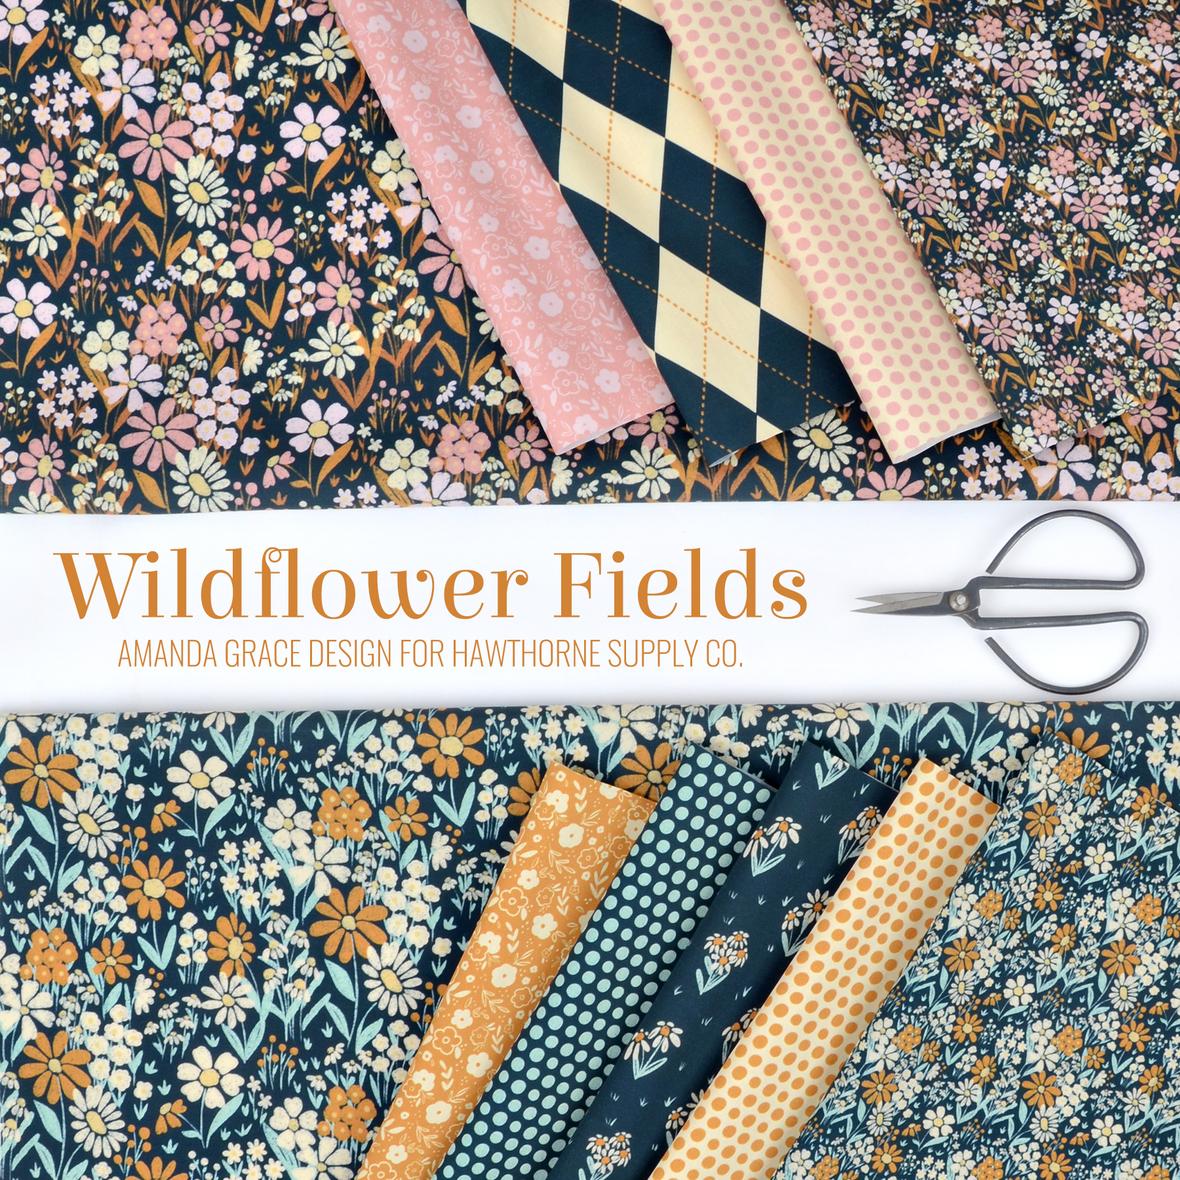 Wildflower Fields Amanda Grace Design Fabric for Hawthorne Supply Co.